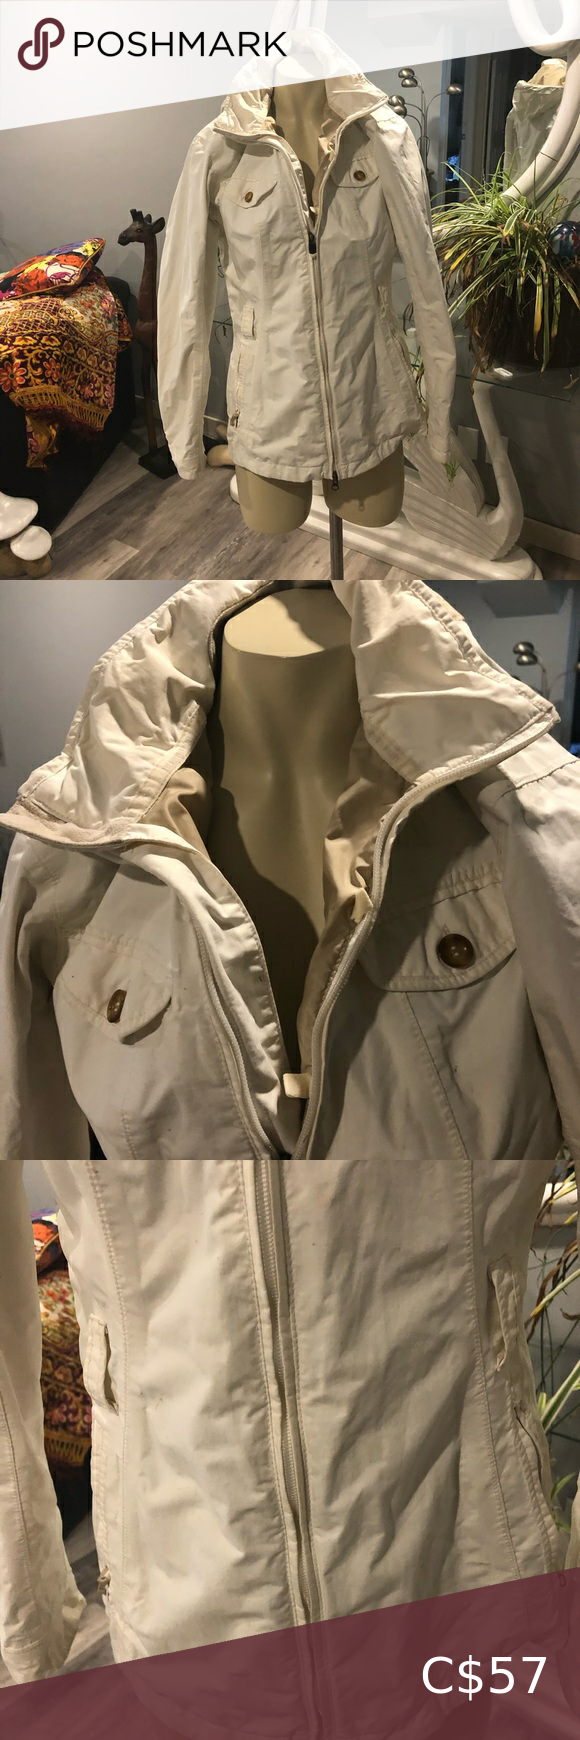 North Face Cream Coloured Lightweight Jacket North Face Jacket Womens White North Face Jacket North Face Puffer Jacket [ 1740 x 580 Pixel ]